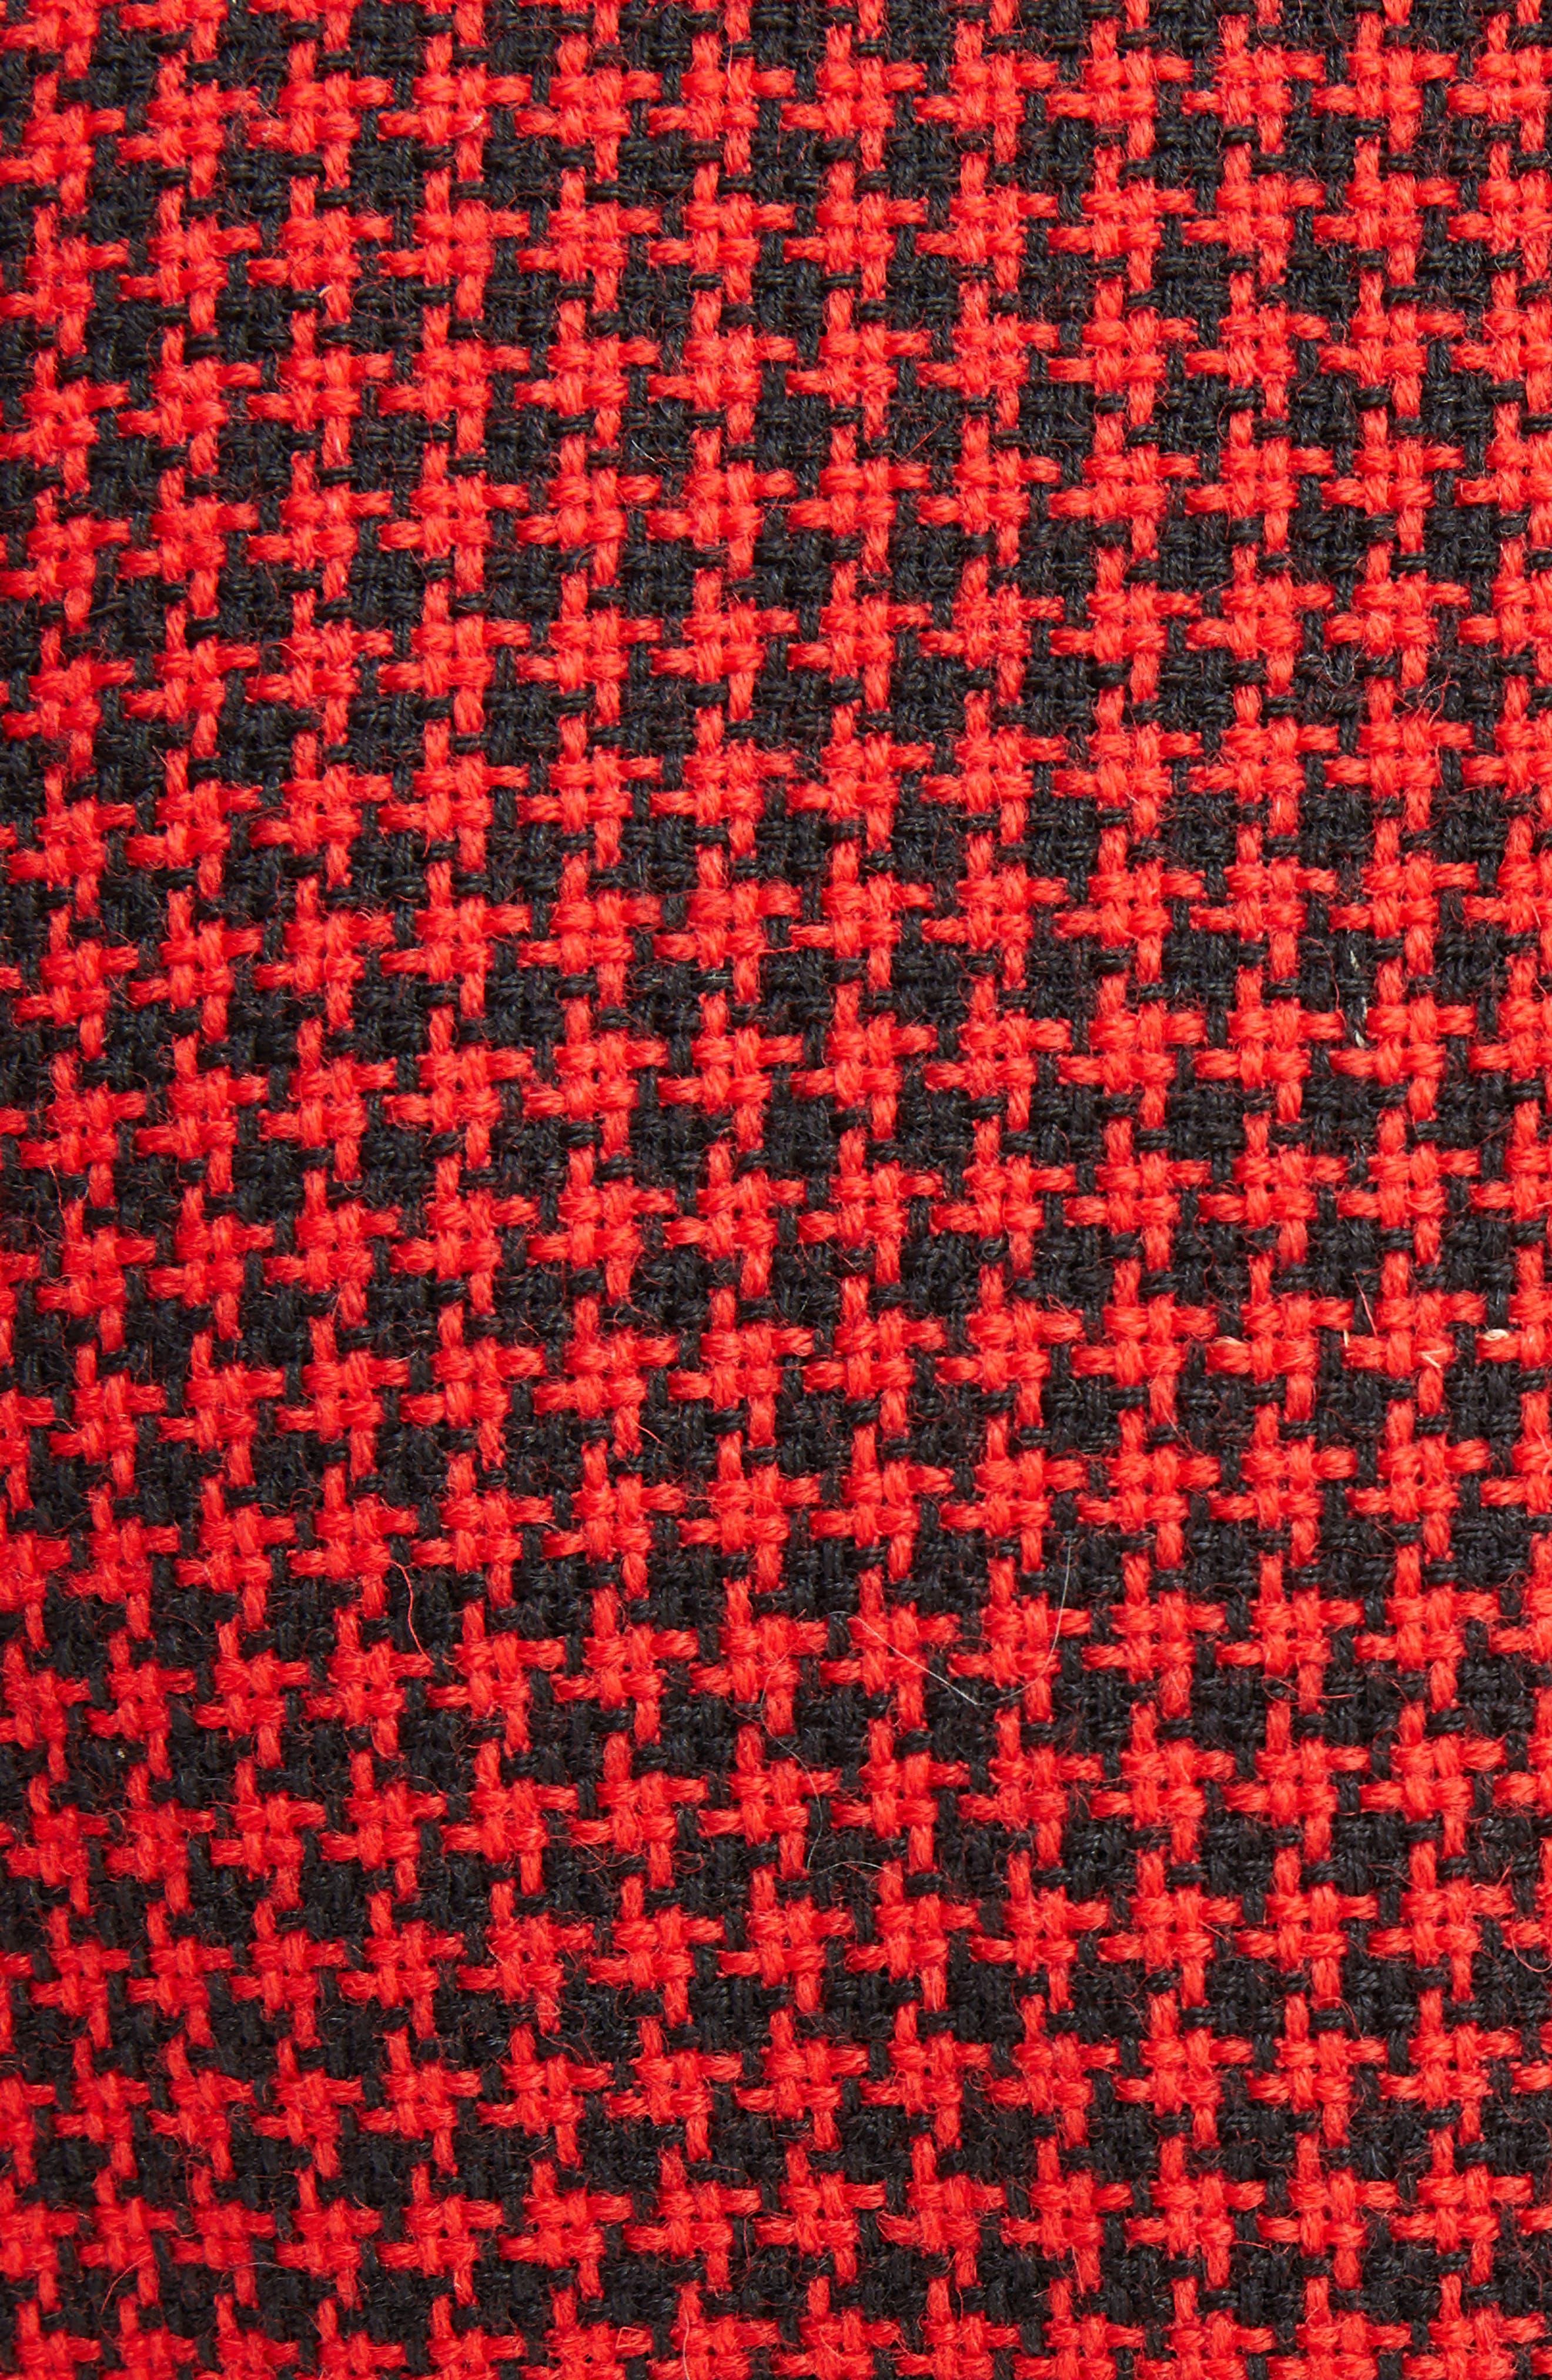 Paladini Houndstooth Wool Jacket,                             Alternate thumbnail 5, color,                             Scarlet/ Black